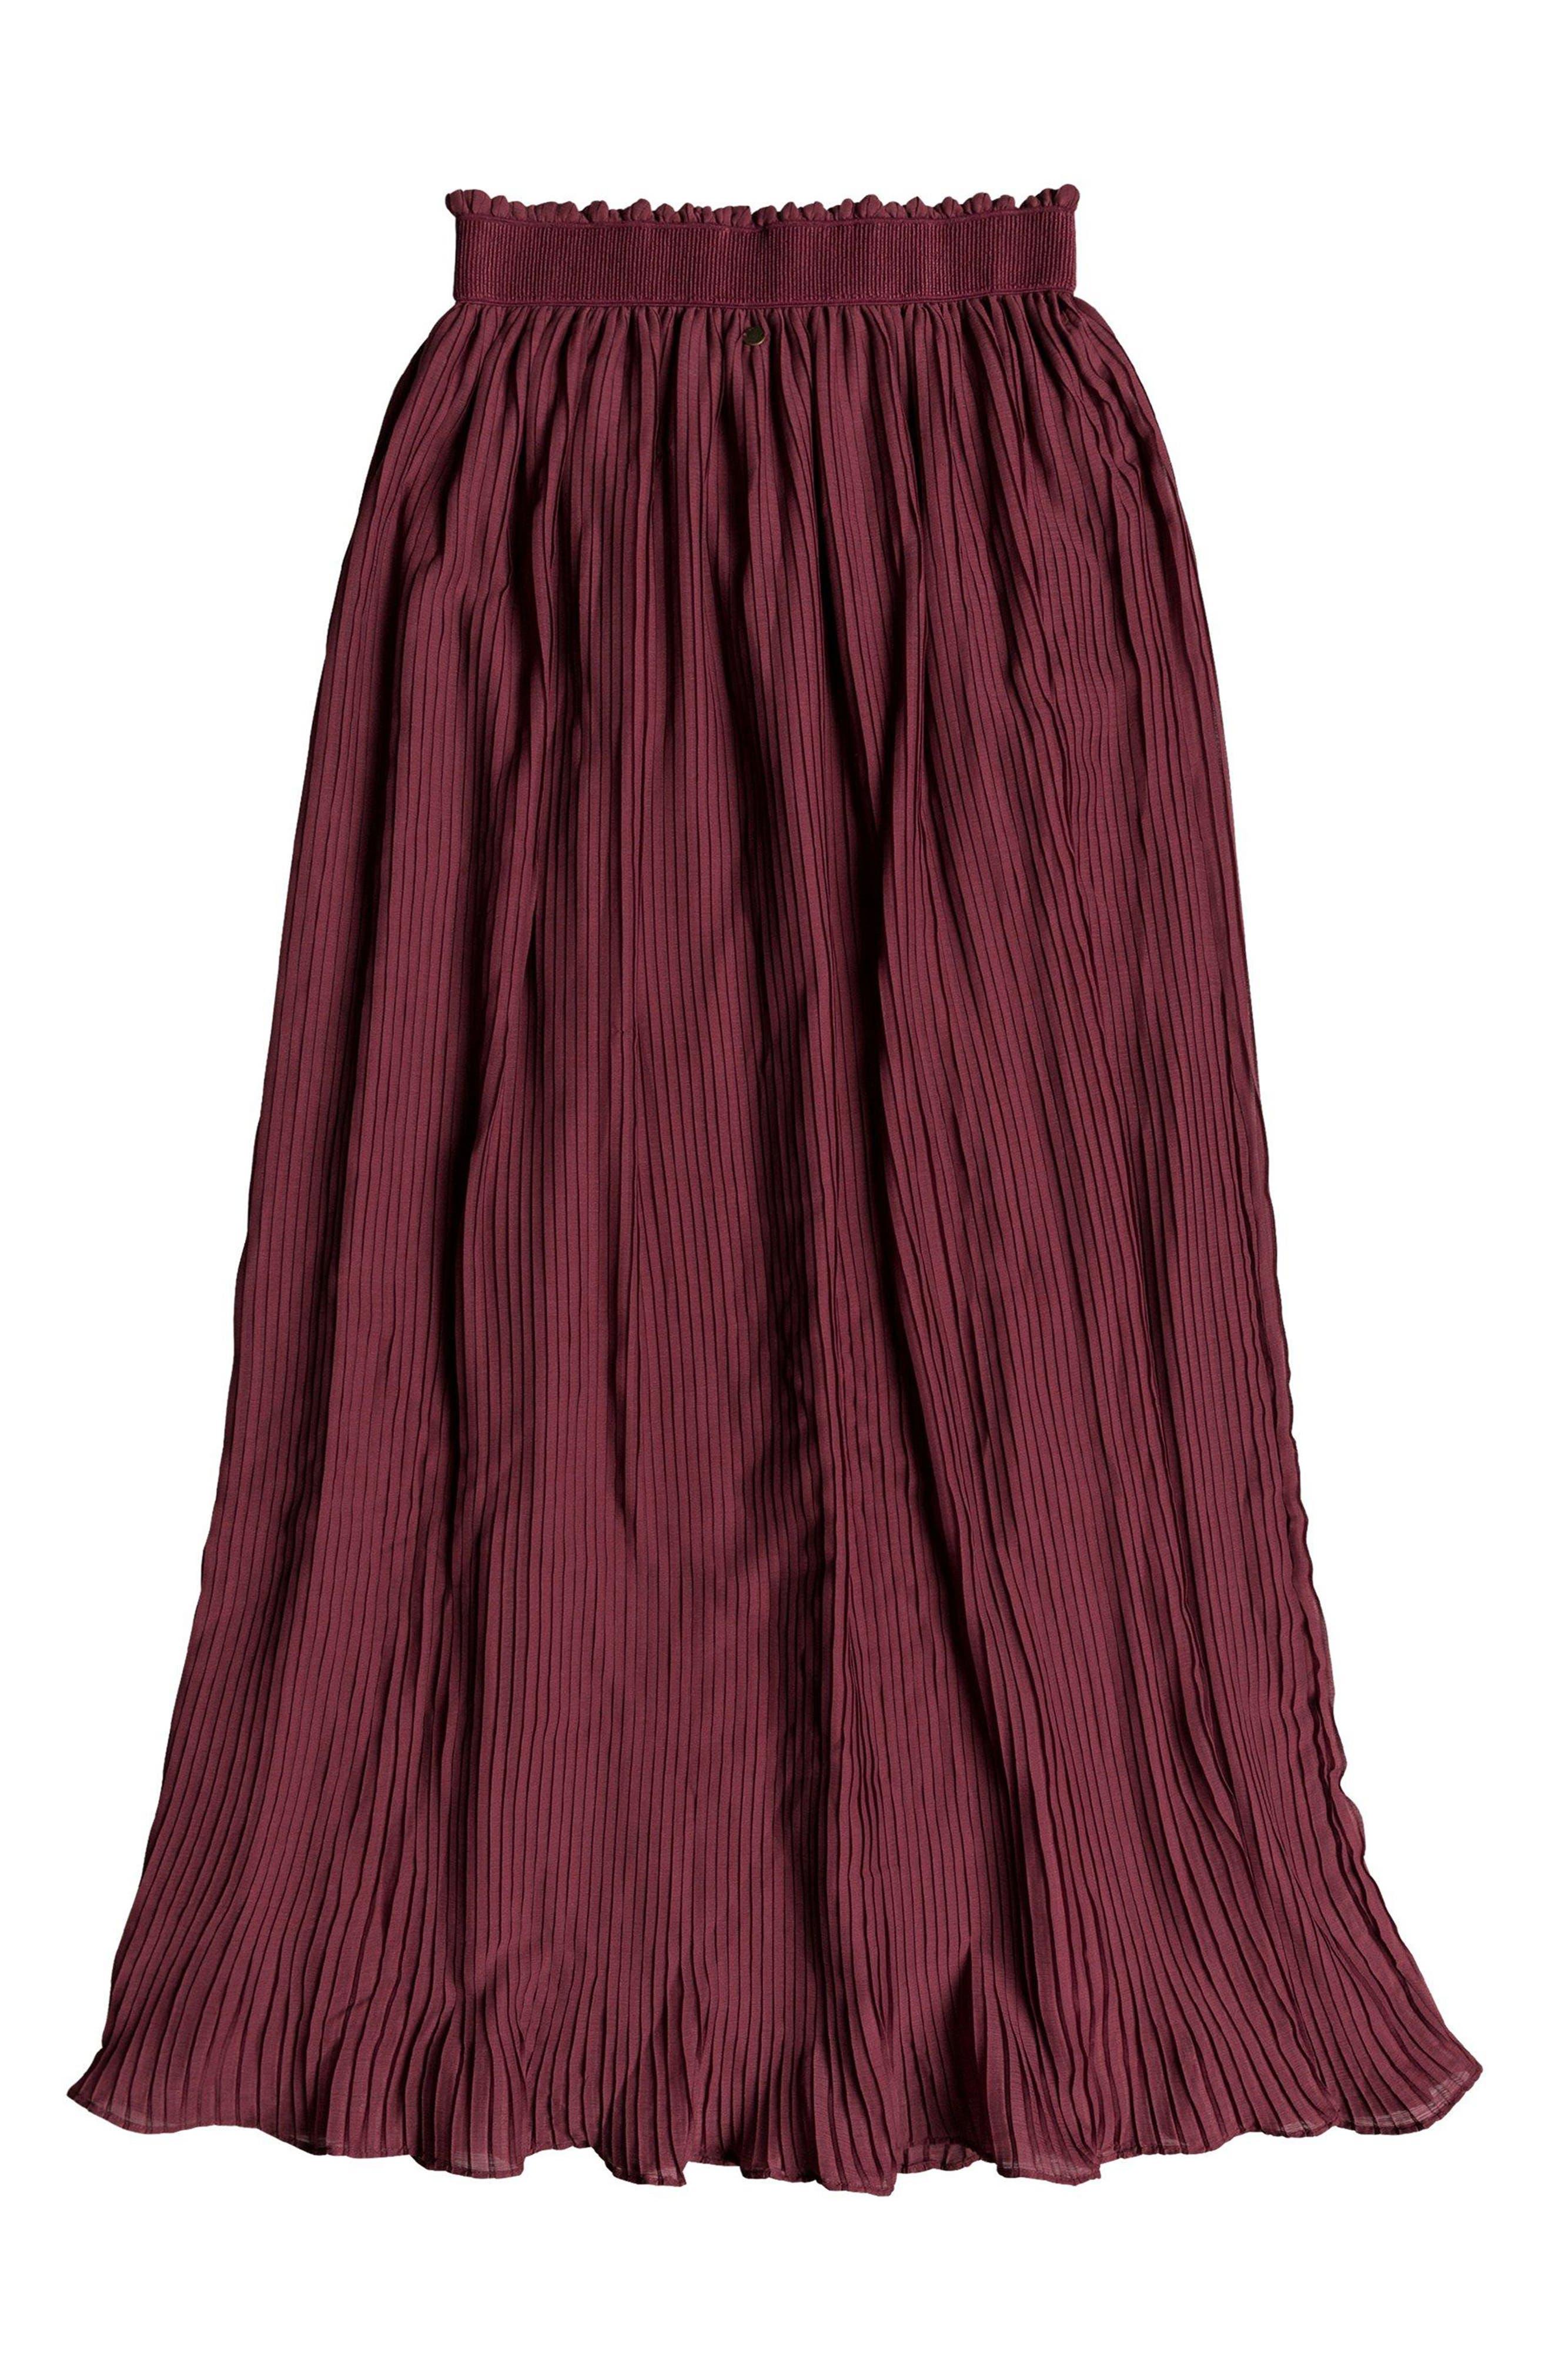 ROXY,                             Green Canyon Midi Skirt,                             Alternate thumbnail 5, color,                             OXBLOOD RED